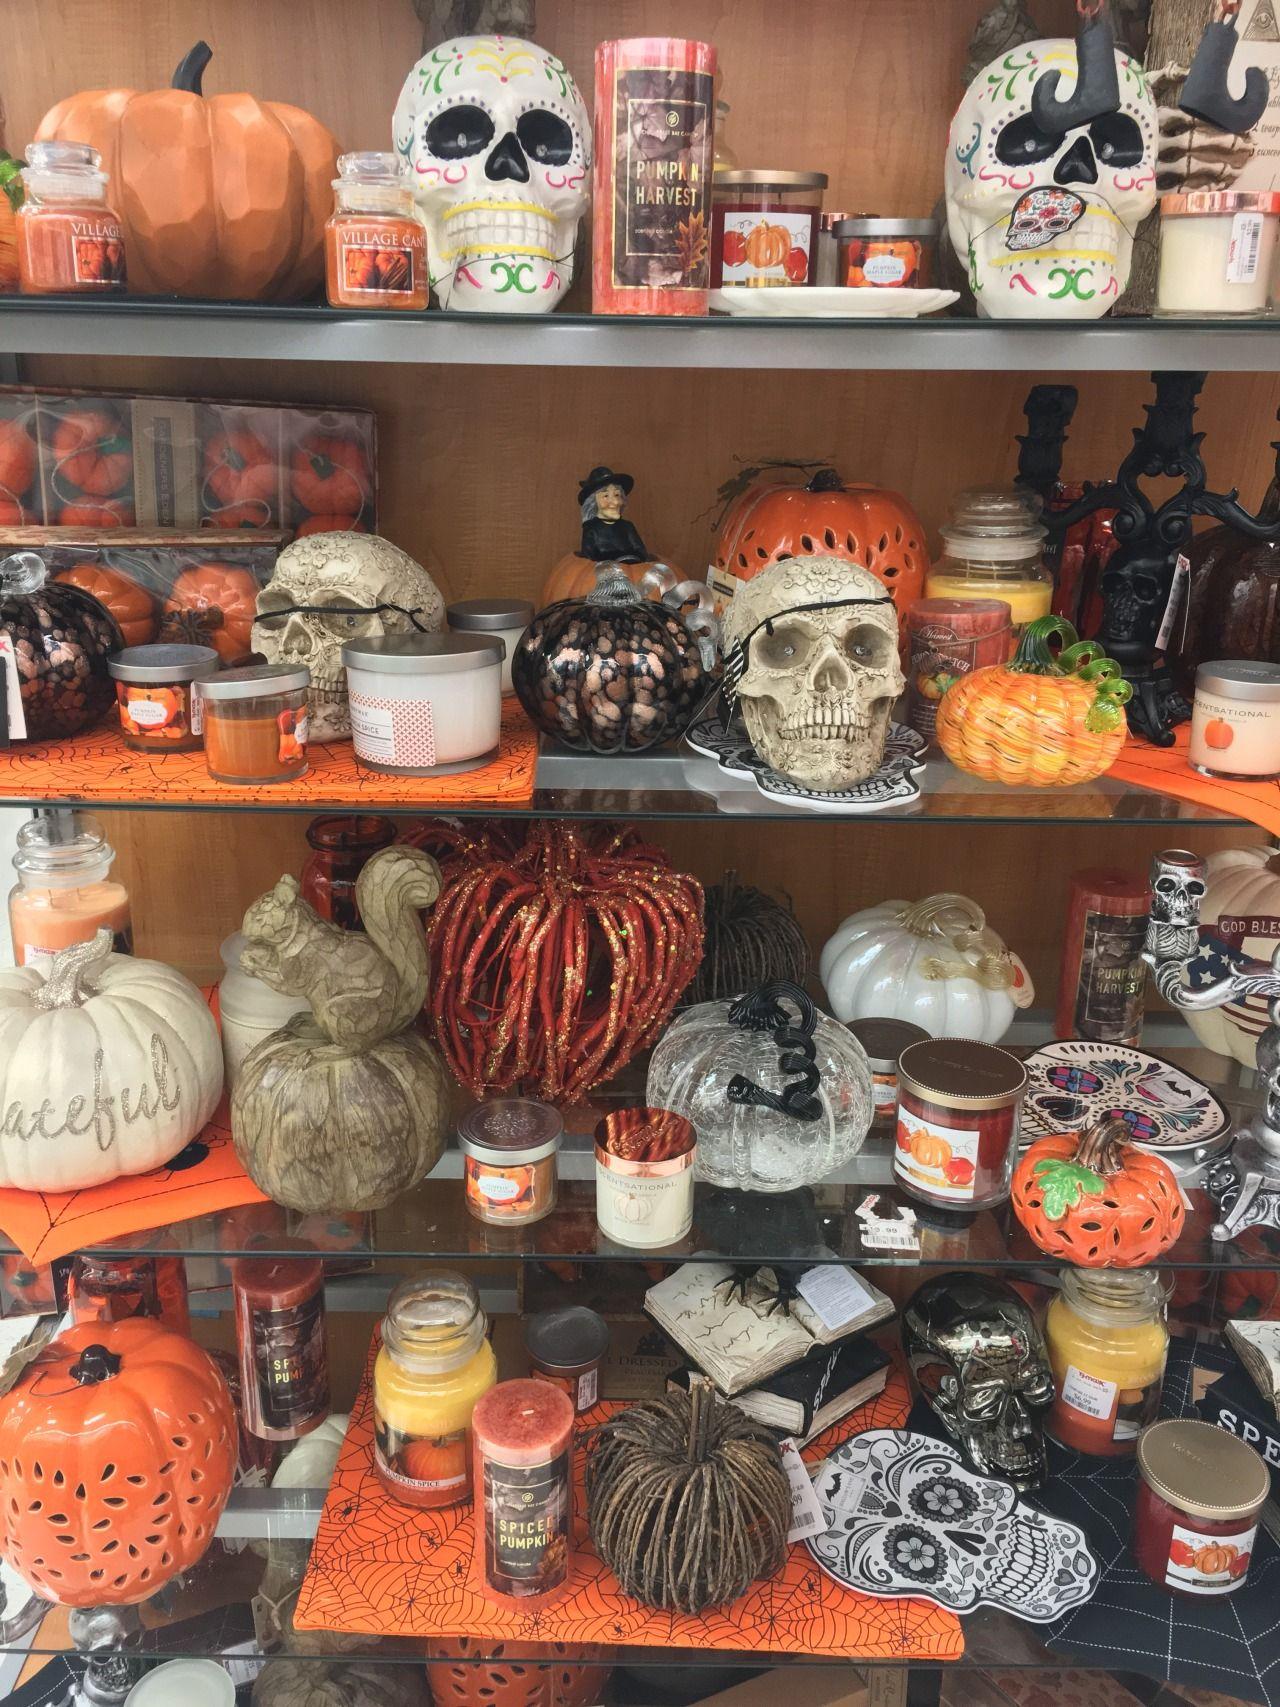 Tricky Treats Ghostly Sigh Tj Maxx Today Halloween Decorations Halloween 2017 Treats